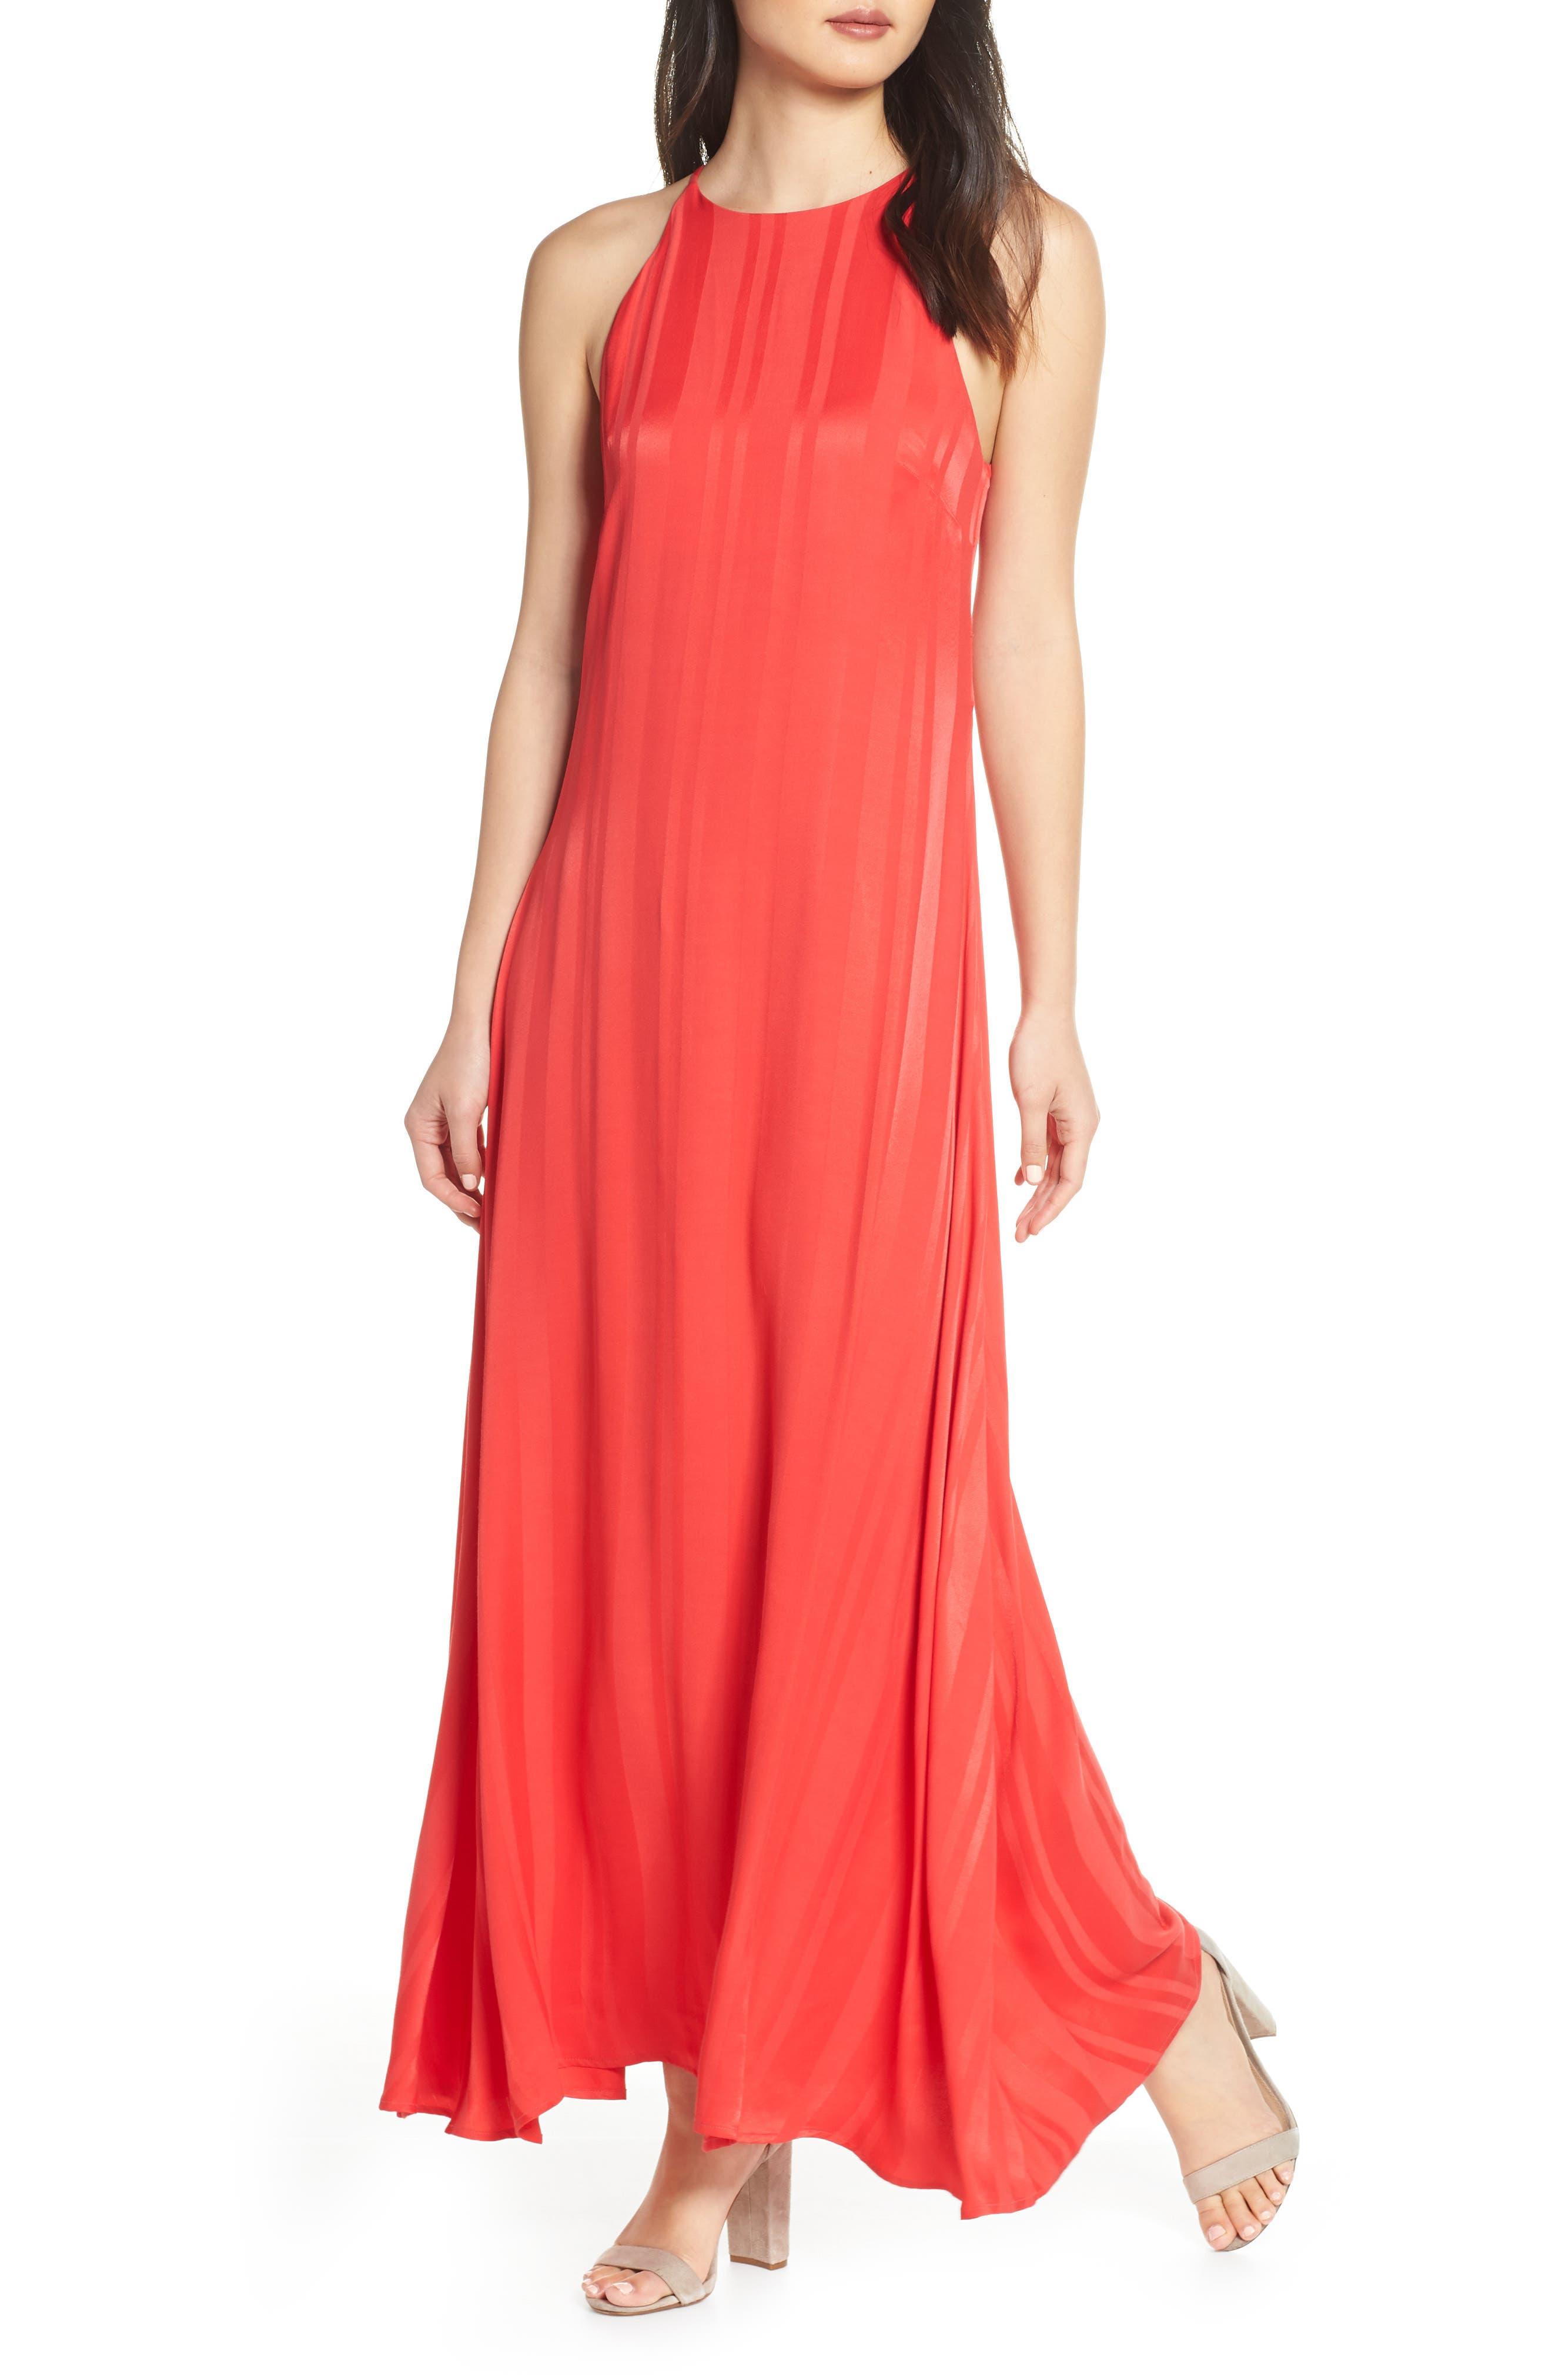 Nsr Paola Halter Maxi Dress, Red